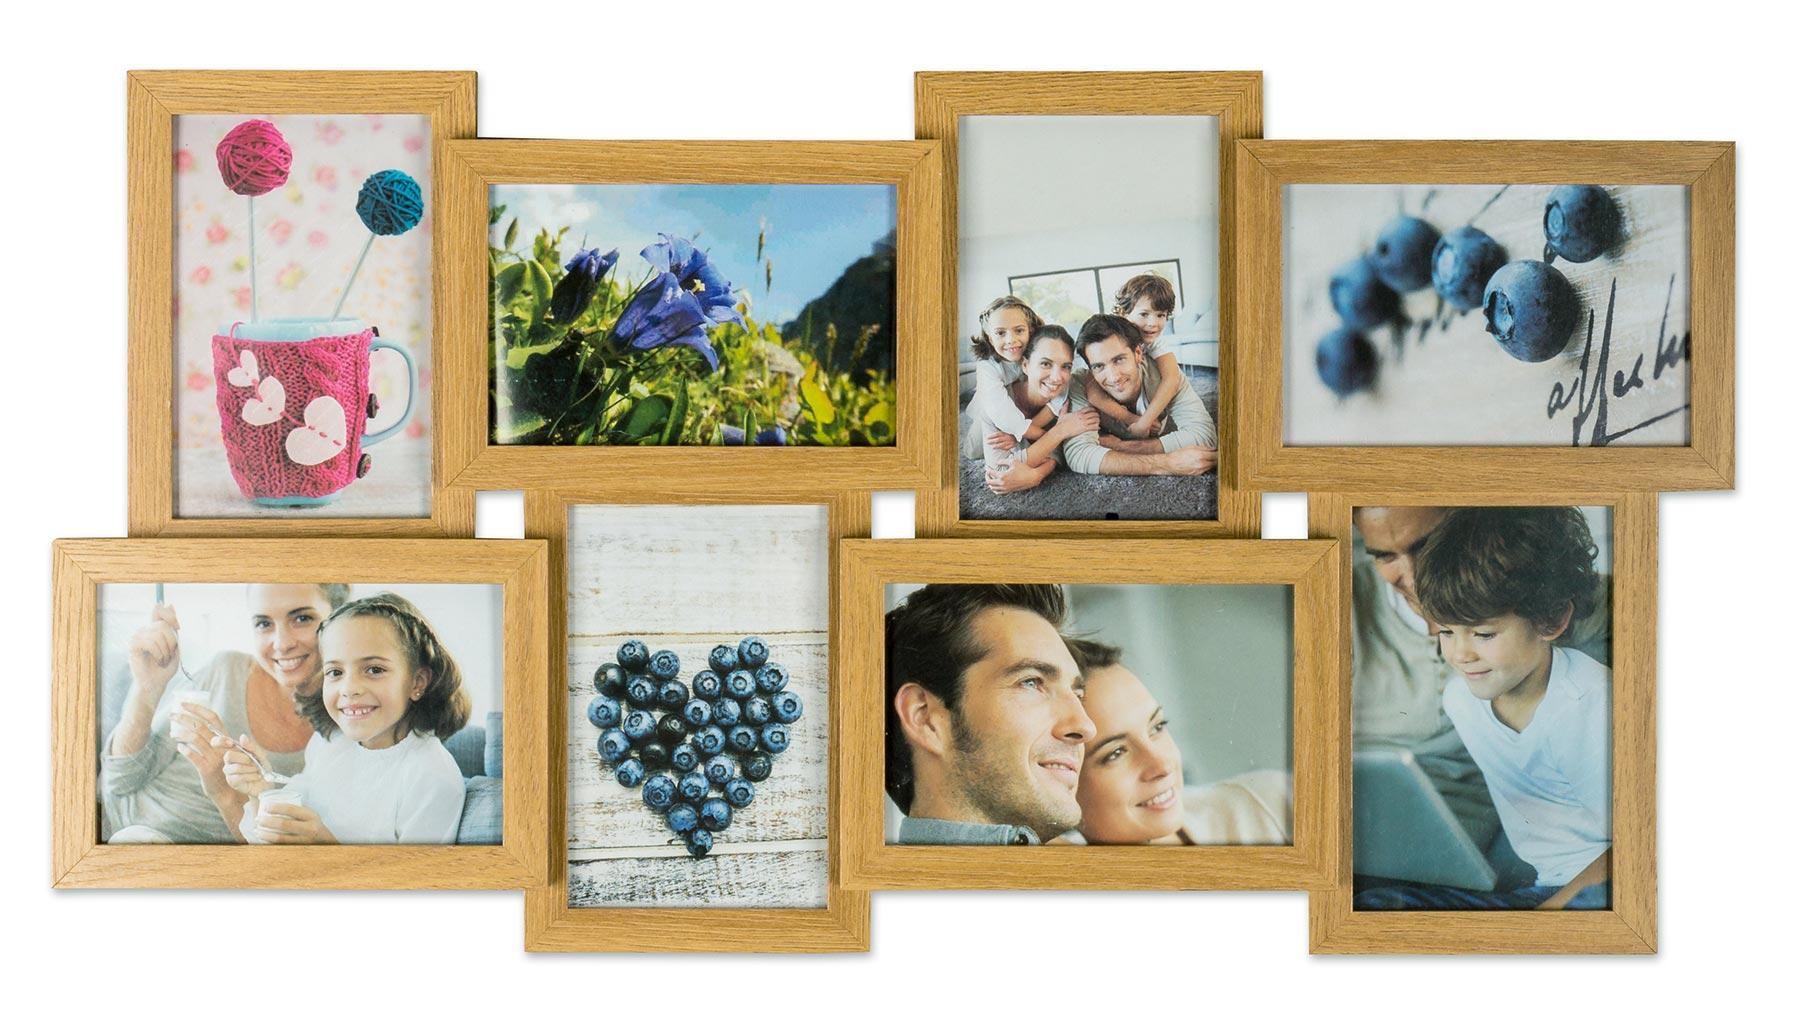 levandeo bilderrahmen collage 57x30cm 8 fotos 10x15 eiche. Black Bedroom Furniture Sets. Home Design Ideas